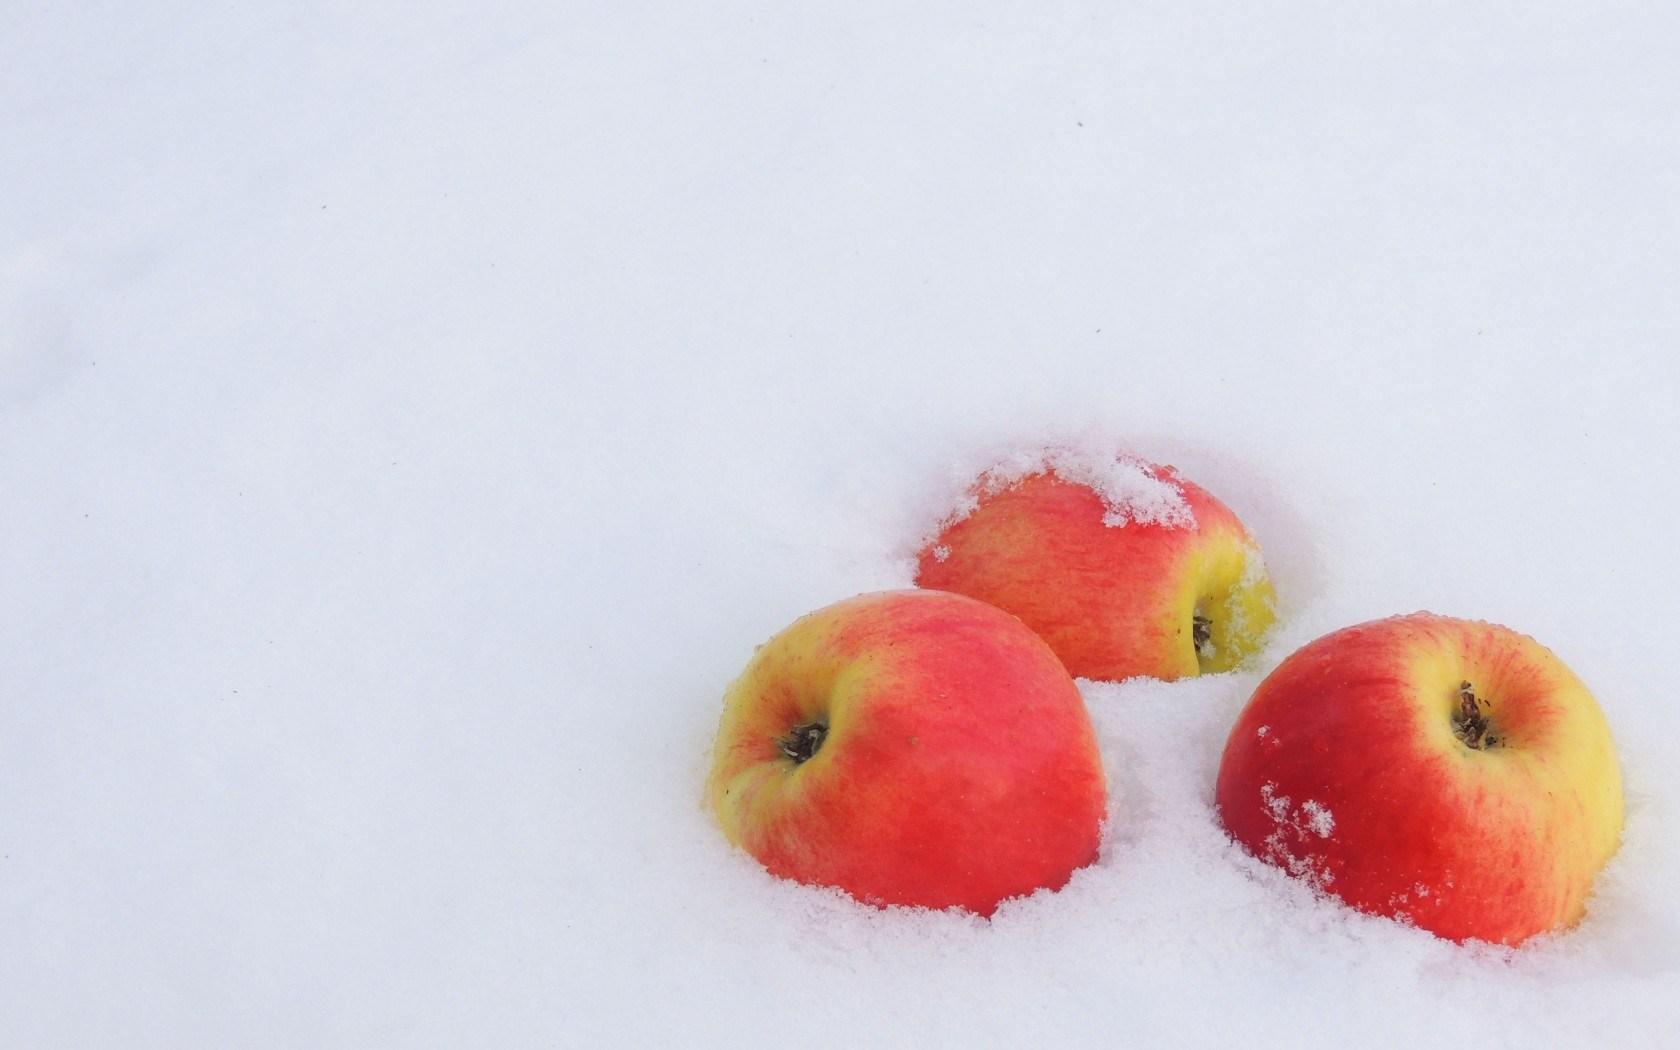 winter snow apples wallpaper [1680x1050]